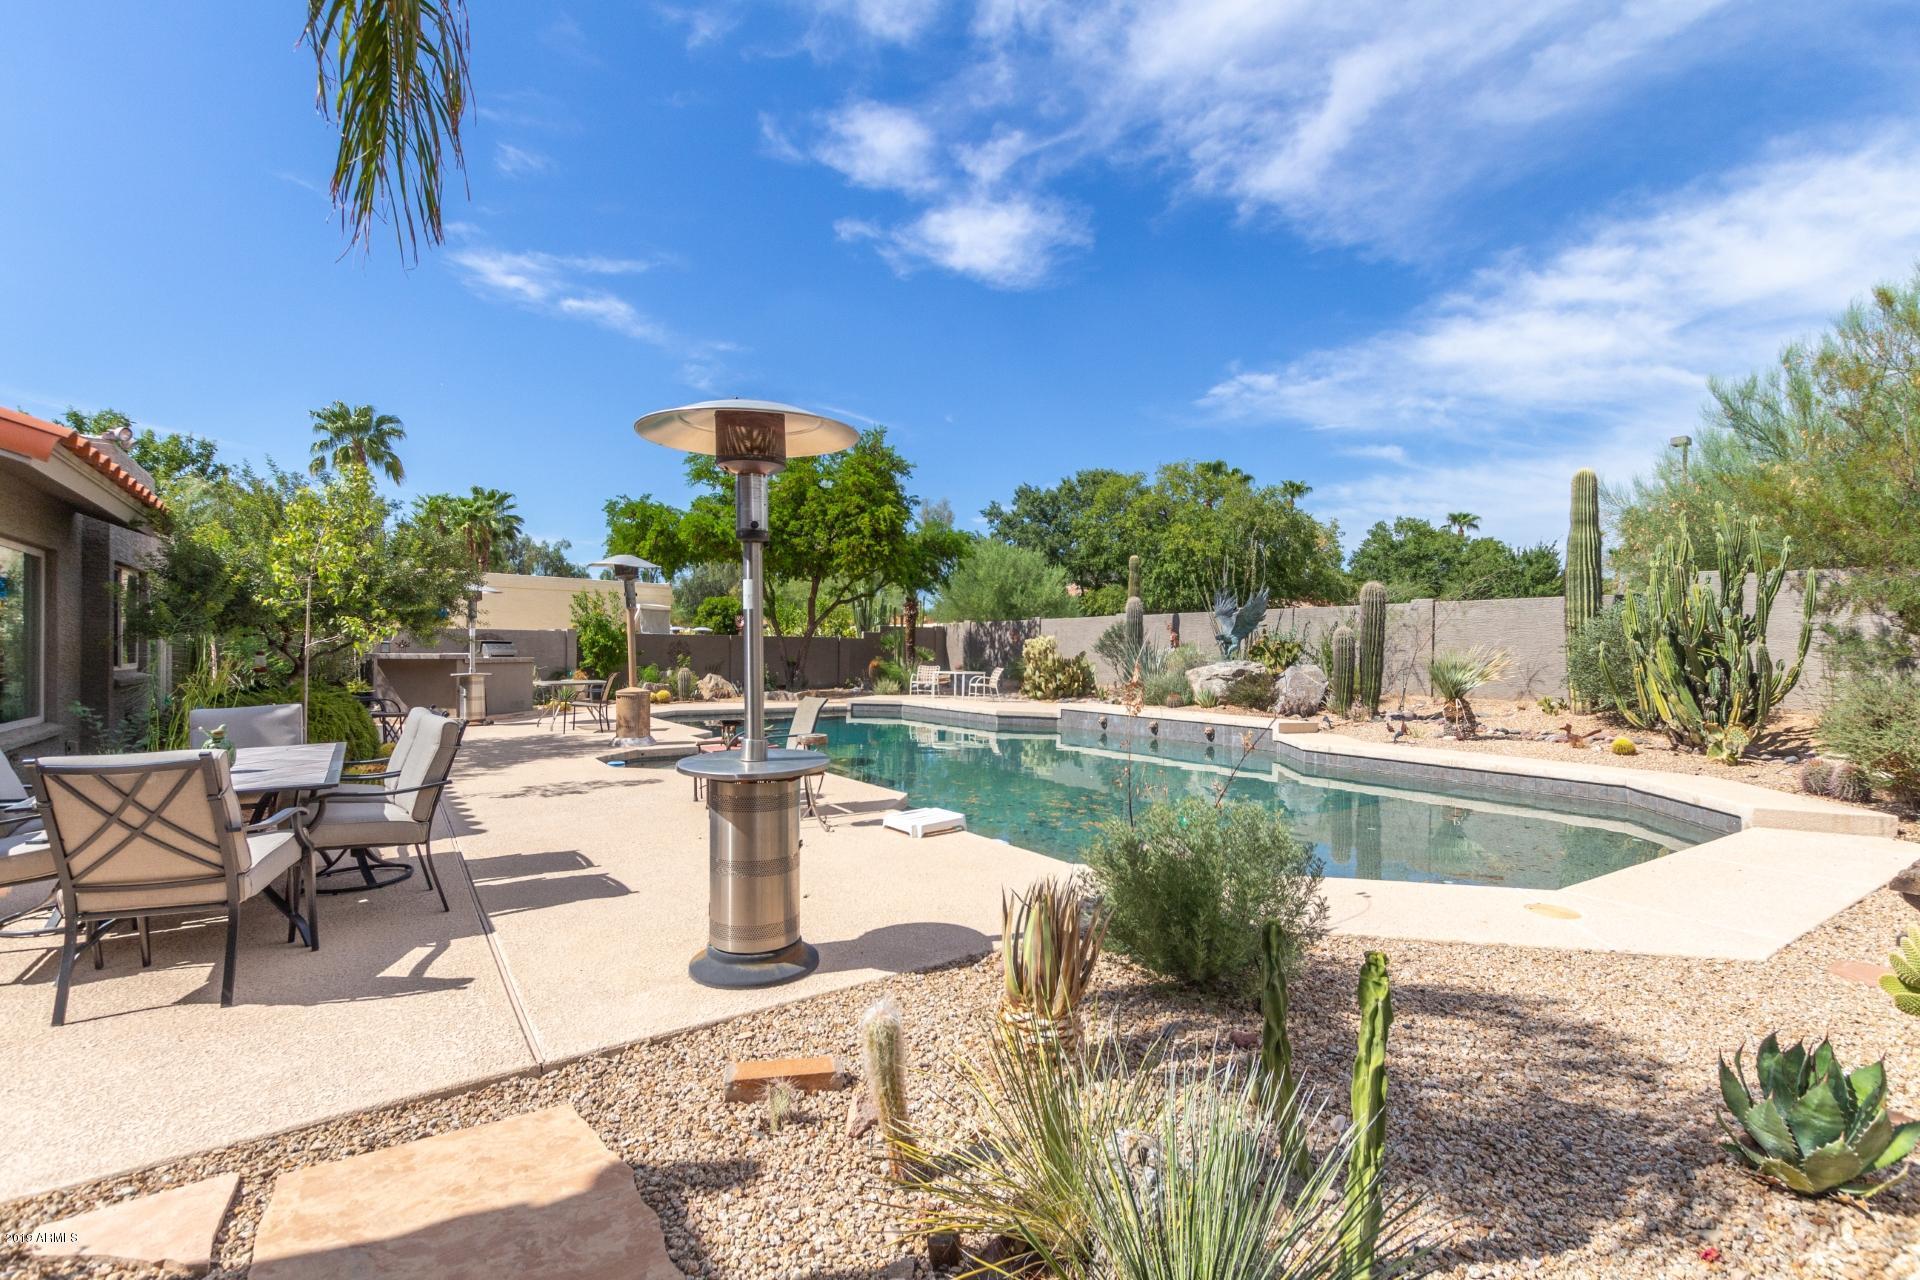 MLS 5963522 9495 N 110TH Street, Scottsdale, AZ 85259 Scottsdale AZ Private Pool